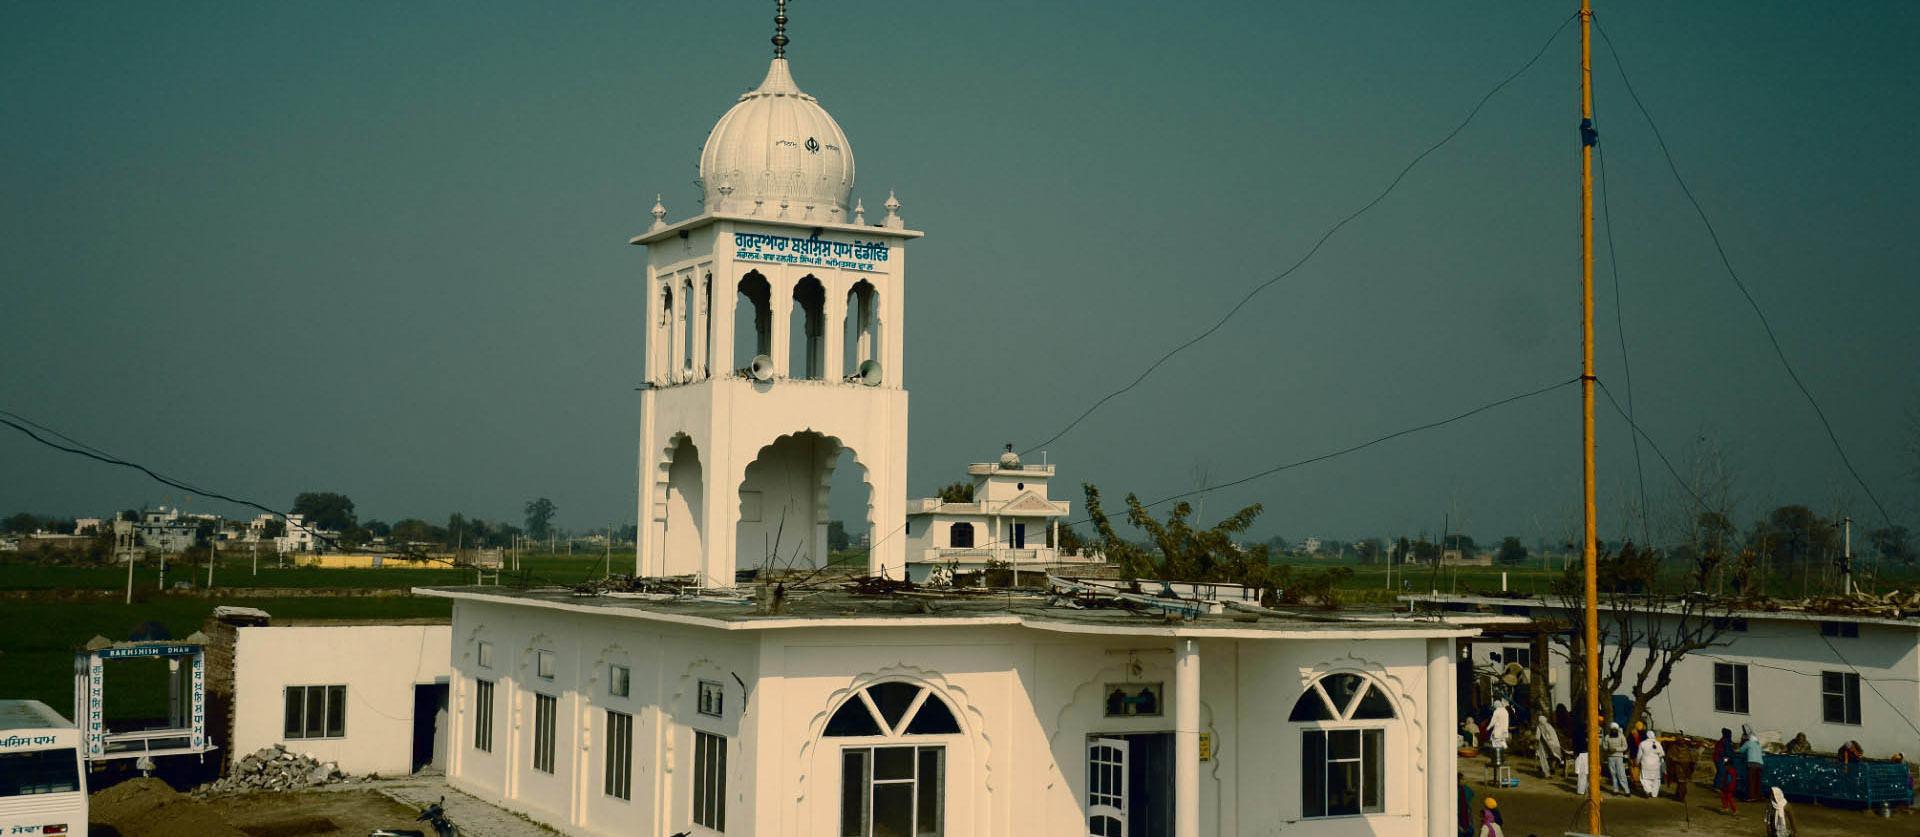 Gurdwara Bakhshish Dham, Dhodiwind, Amritsar